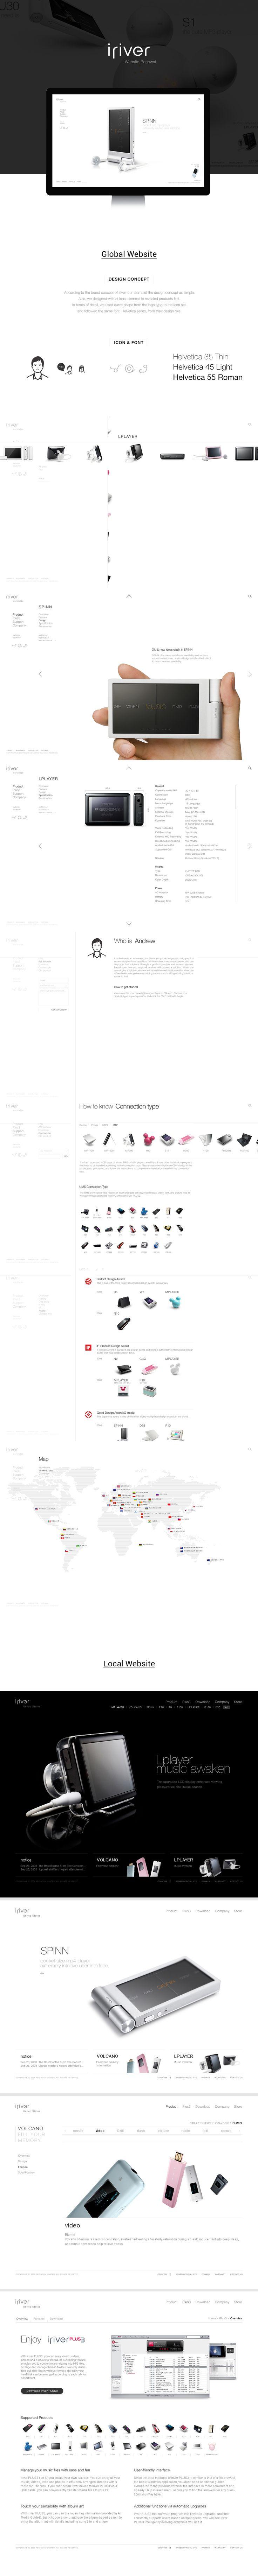 iriver Website Renewal on Behance